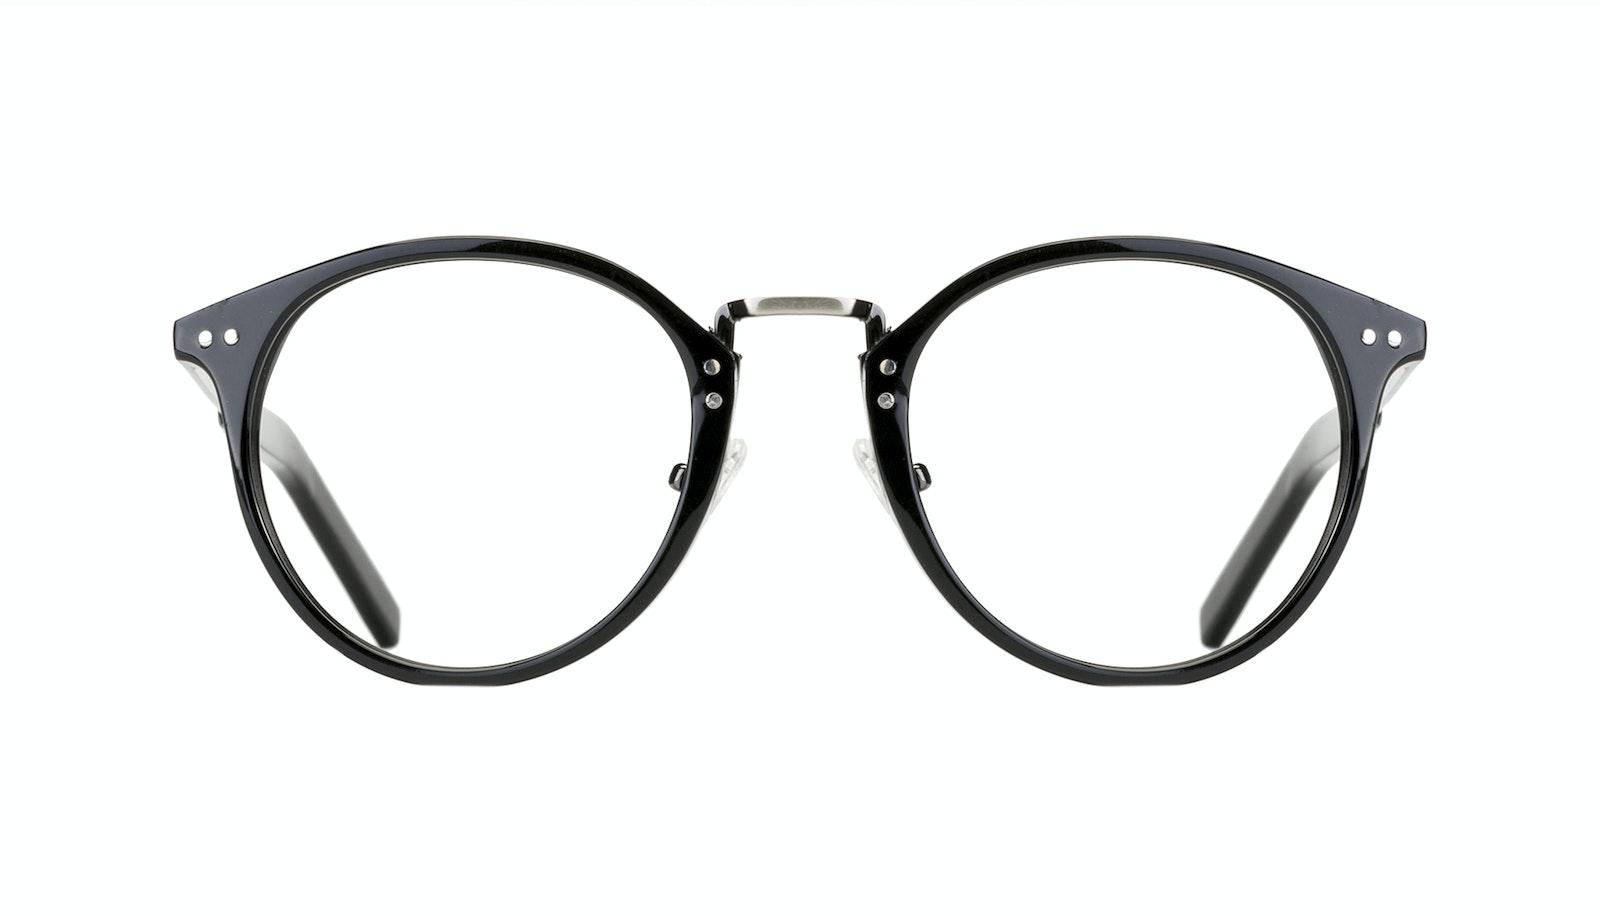 Affordable Fashion Glasses Round Eyeglasses Men Truly Black